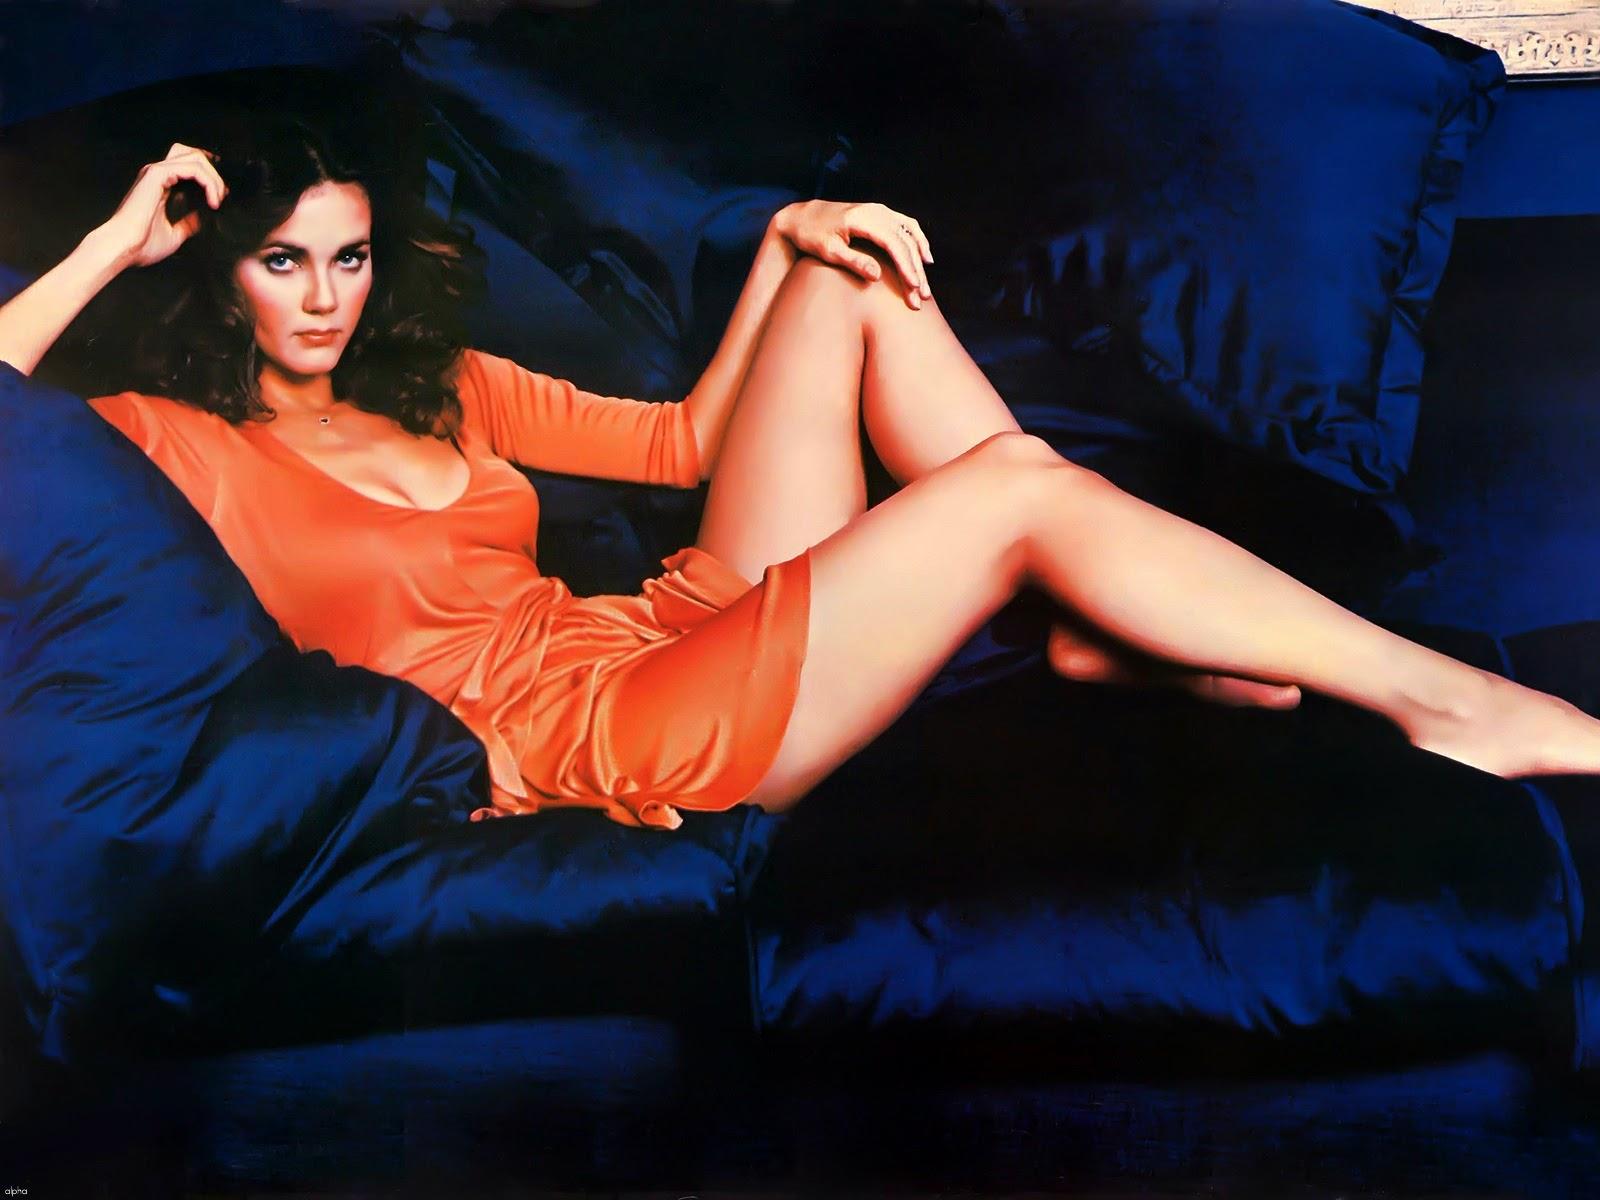 Lynda Carter: Hottest Sexiest Photo Collection | HNN